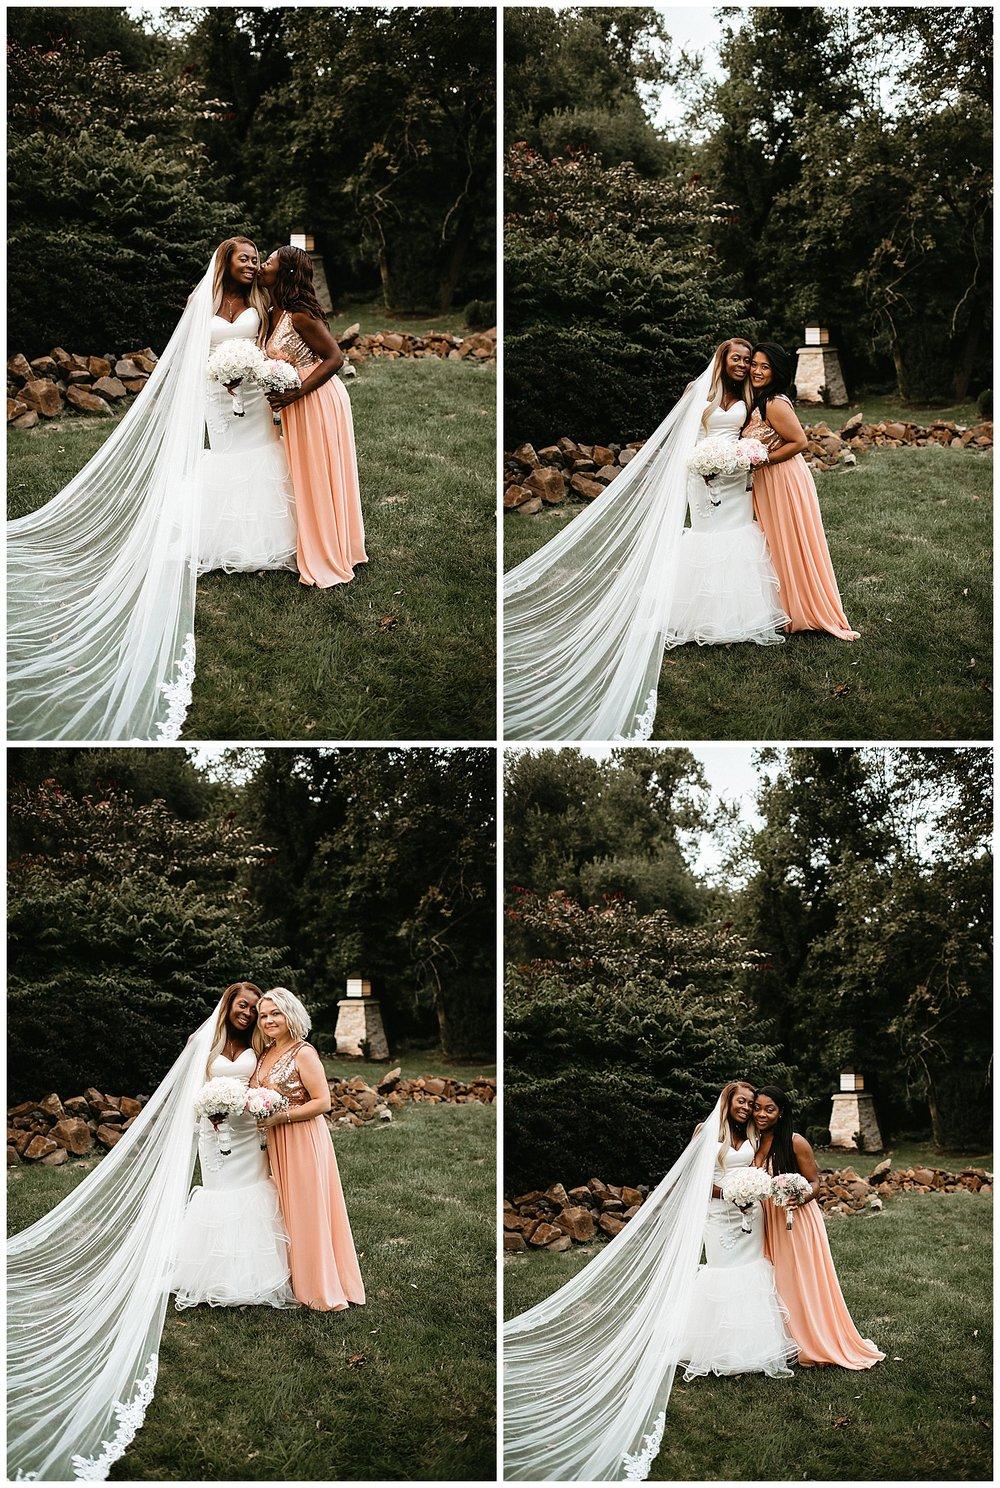 New-Jersey-wedding-photographer-at-Stone-House-at-stirling-ridge-Warren-NJ_0055.jpg